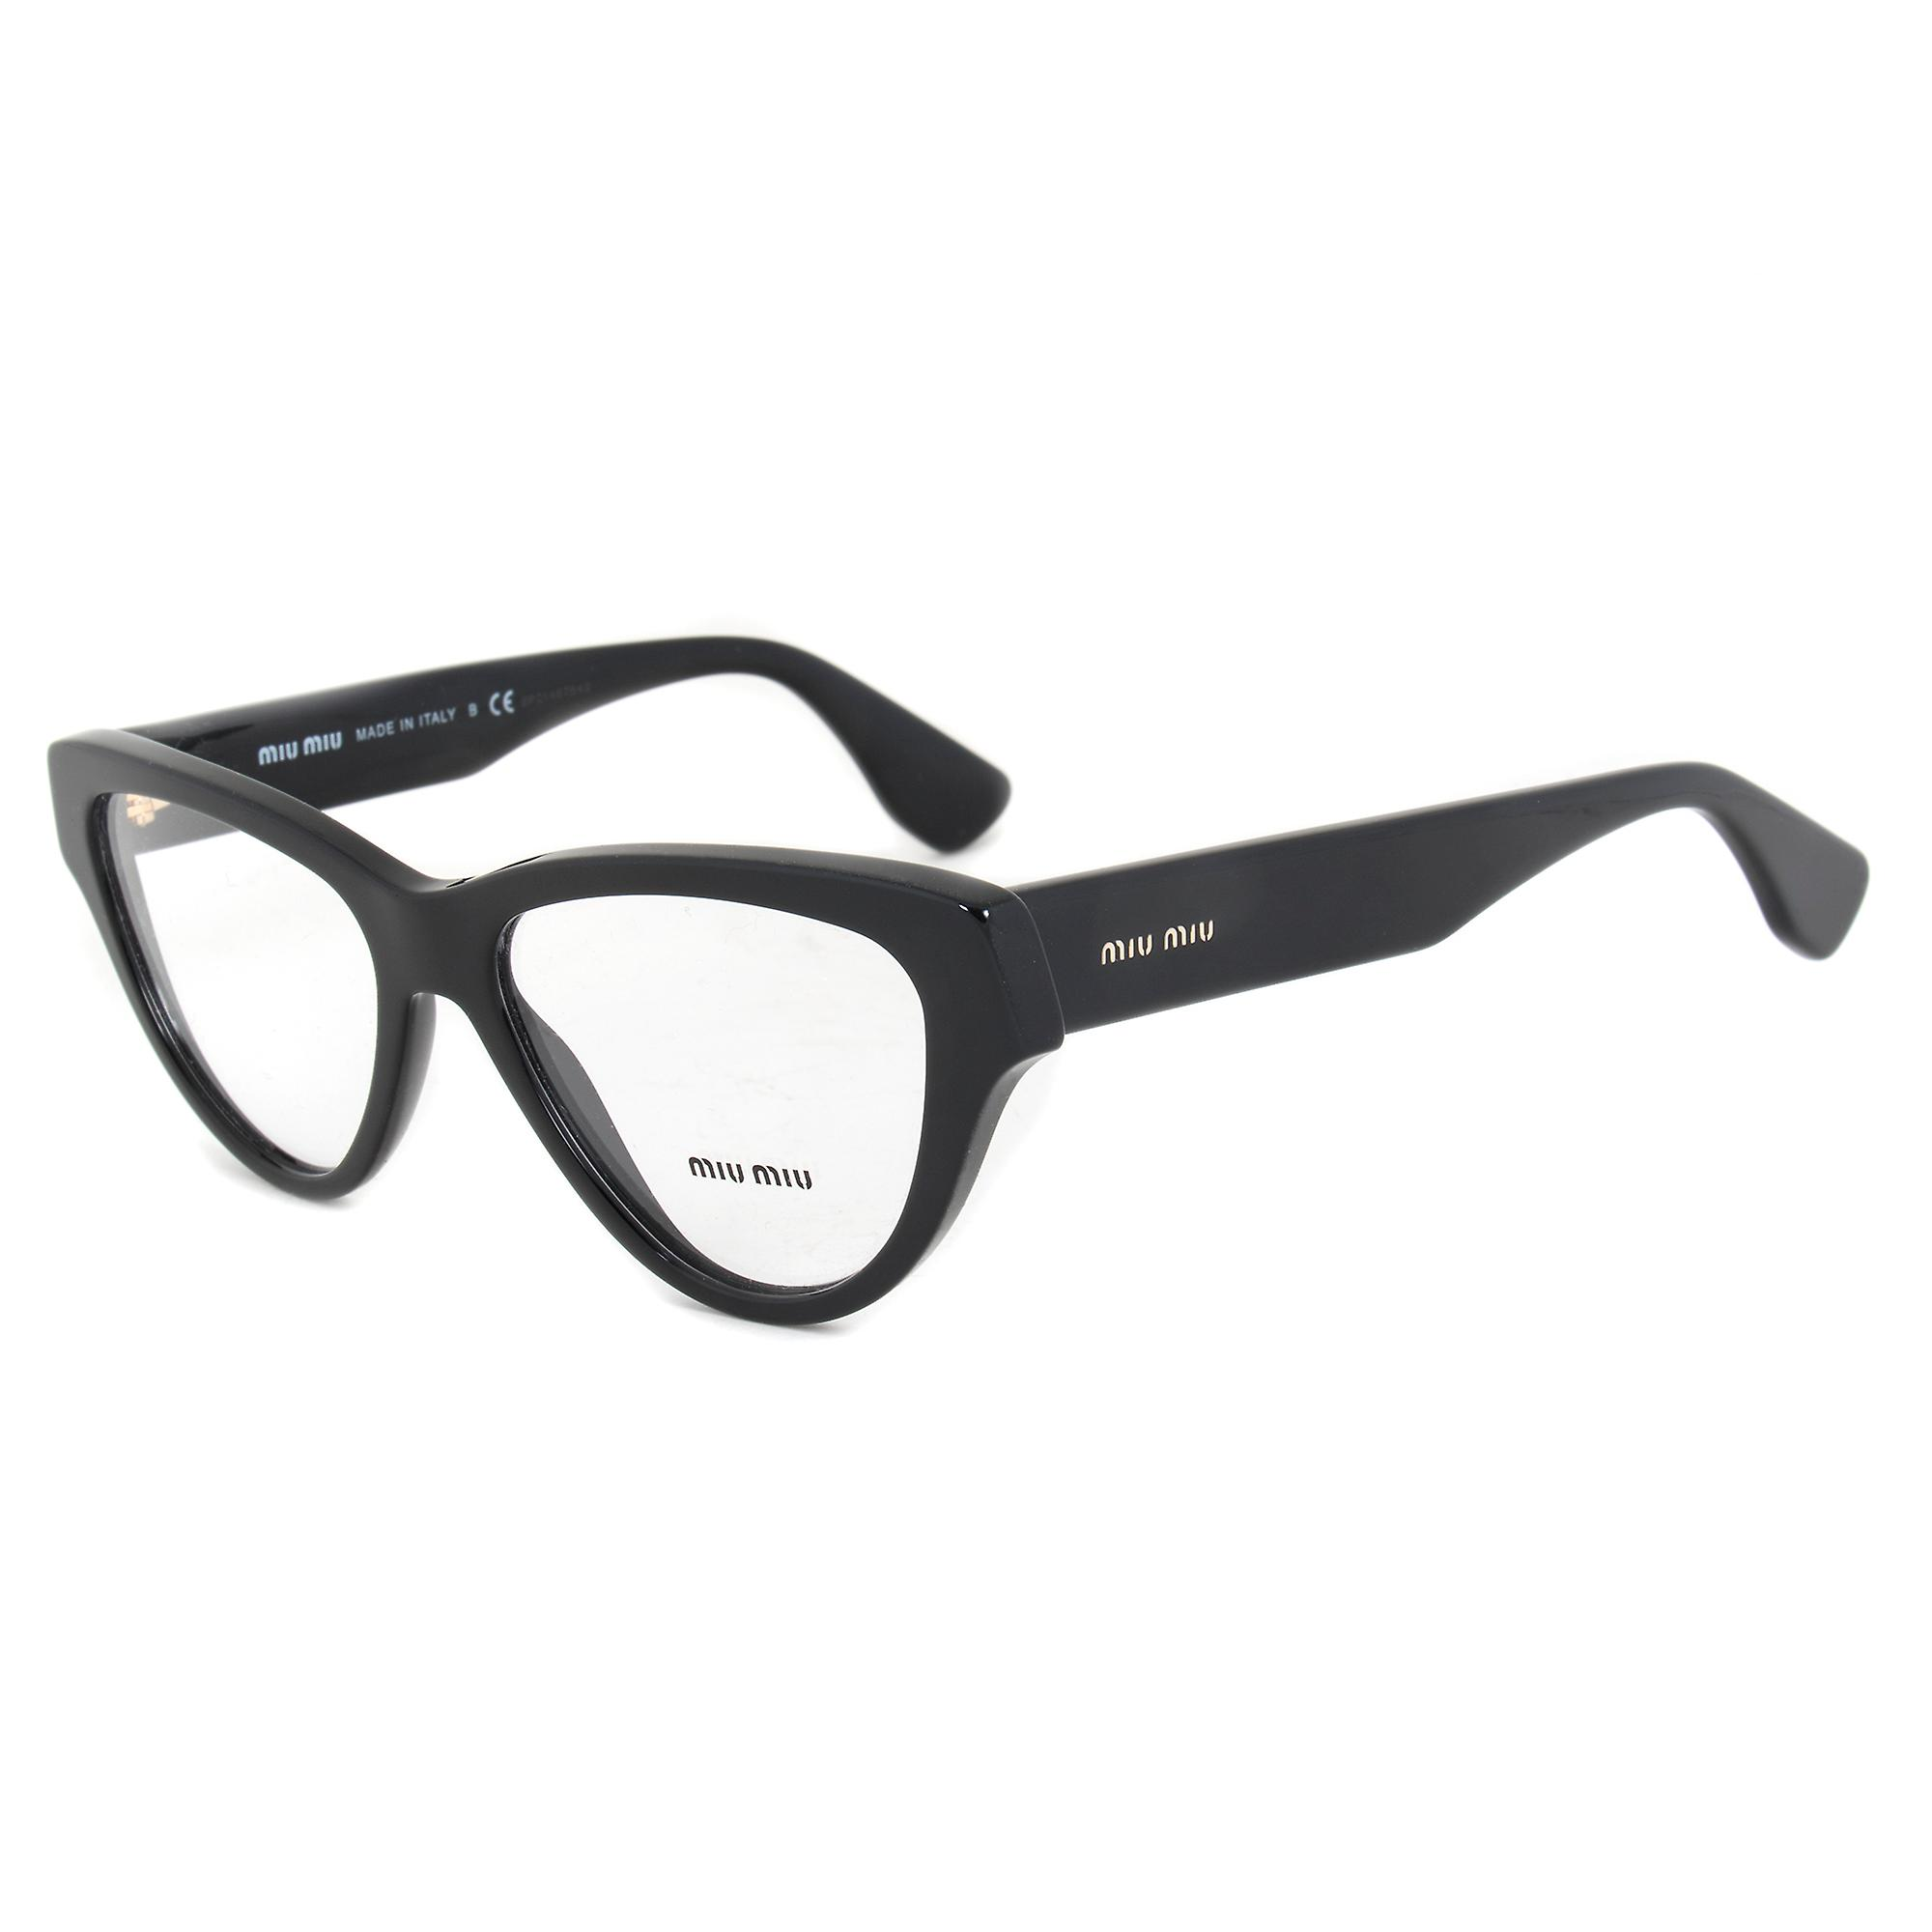 Miu Miu SMU10NVA 1AB1O1 Cat Eye | Black| Eyeglass Frames